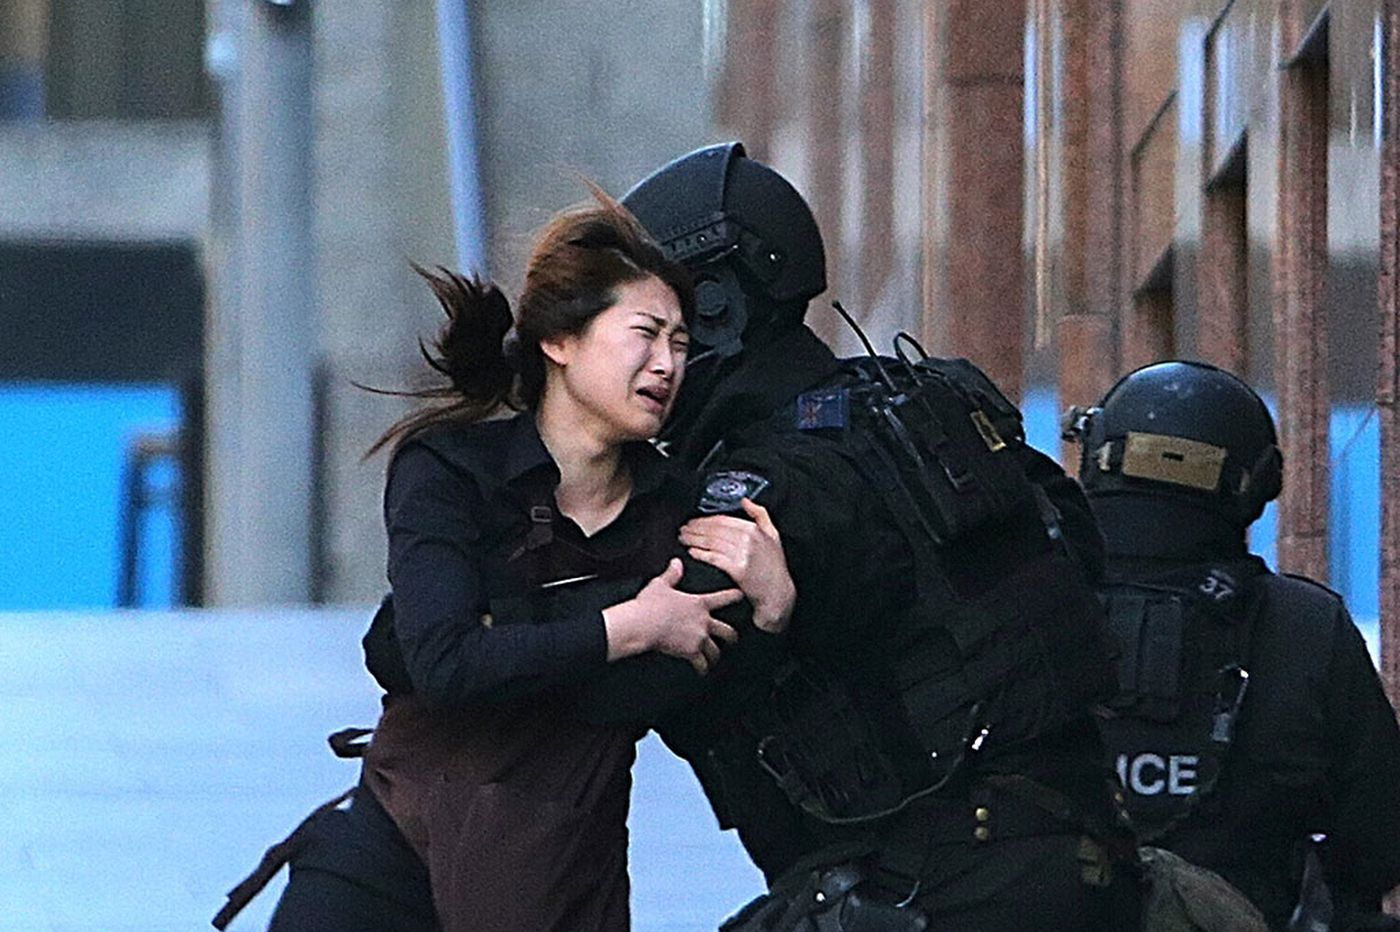 Sydney hostage crisis ends in gunfire; 3 dead